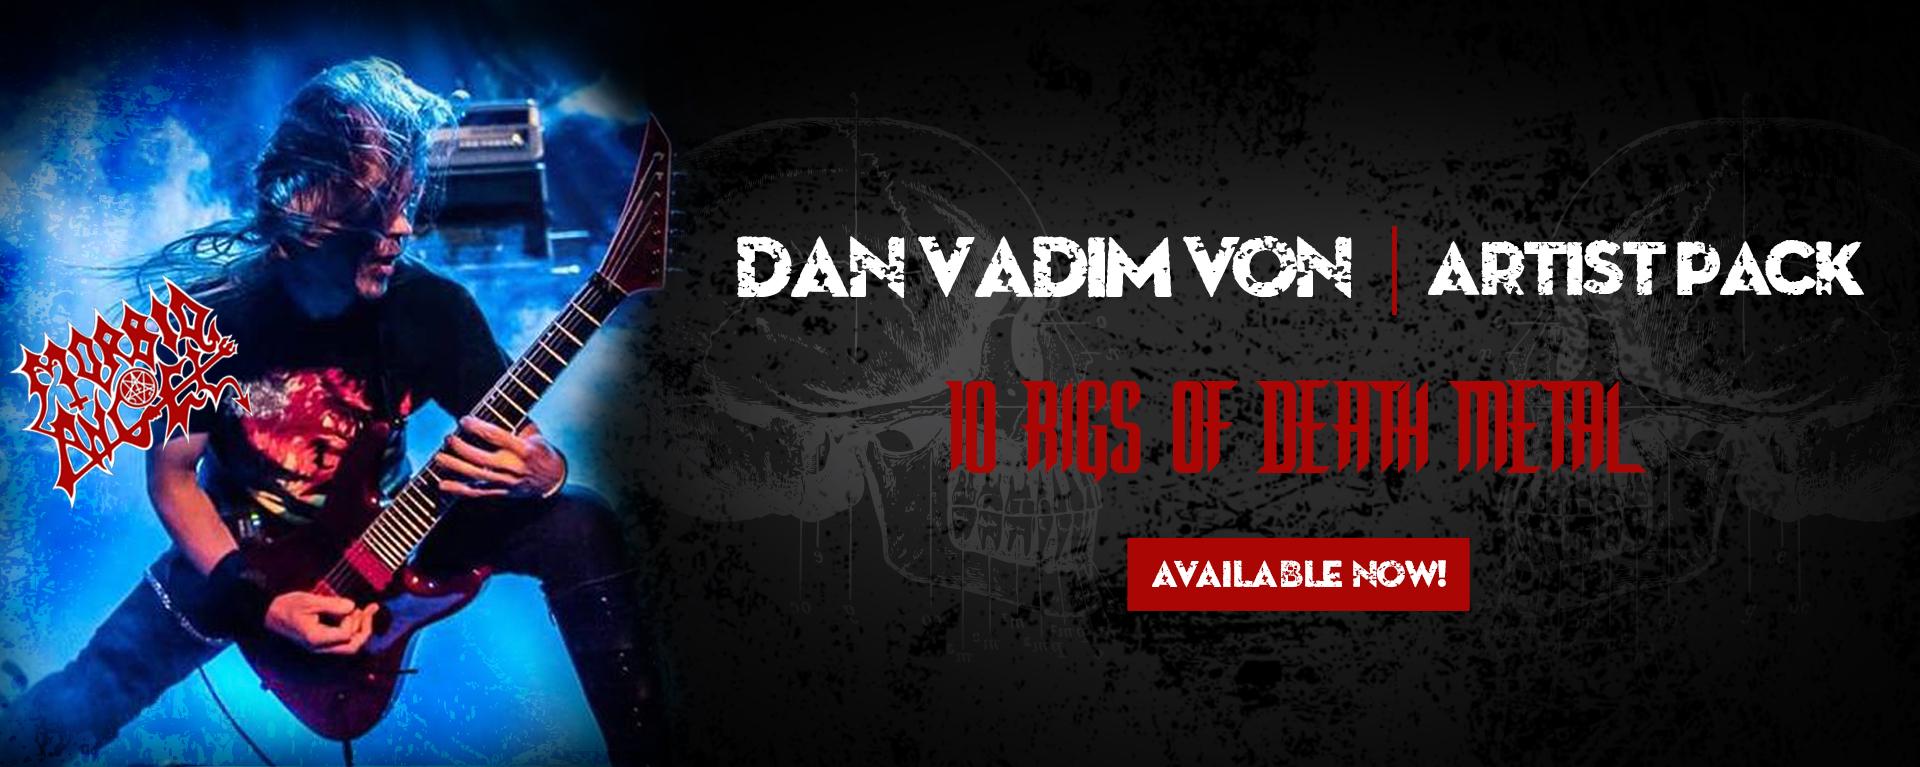 DanVadimVon_ArtistPack_AvailableNow.jpg